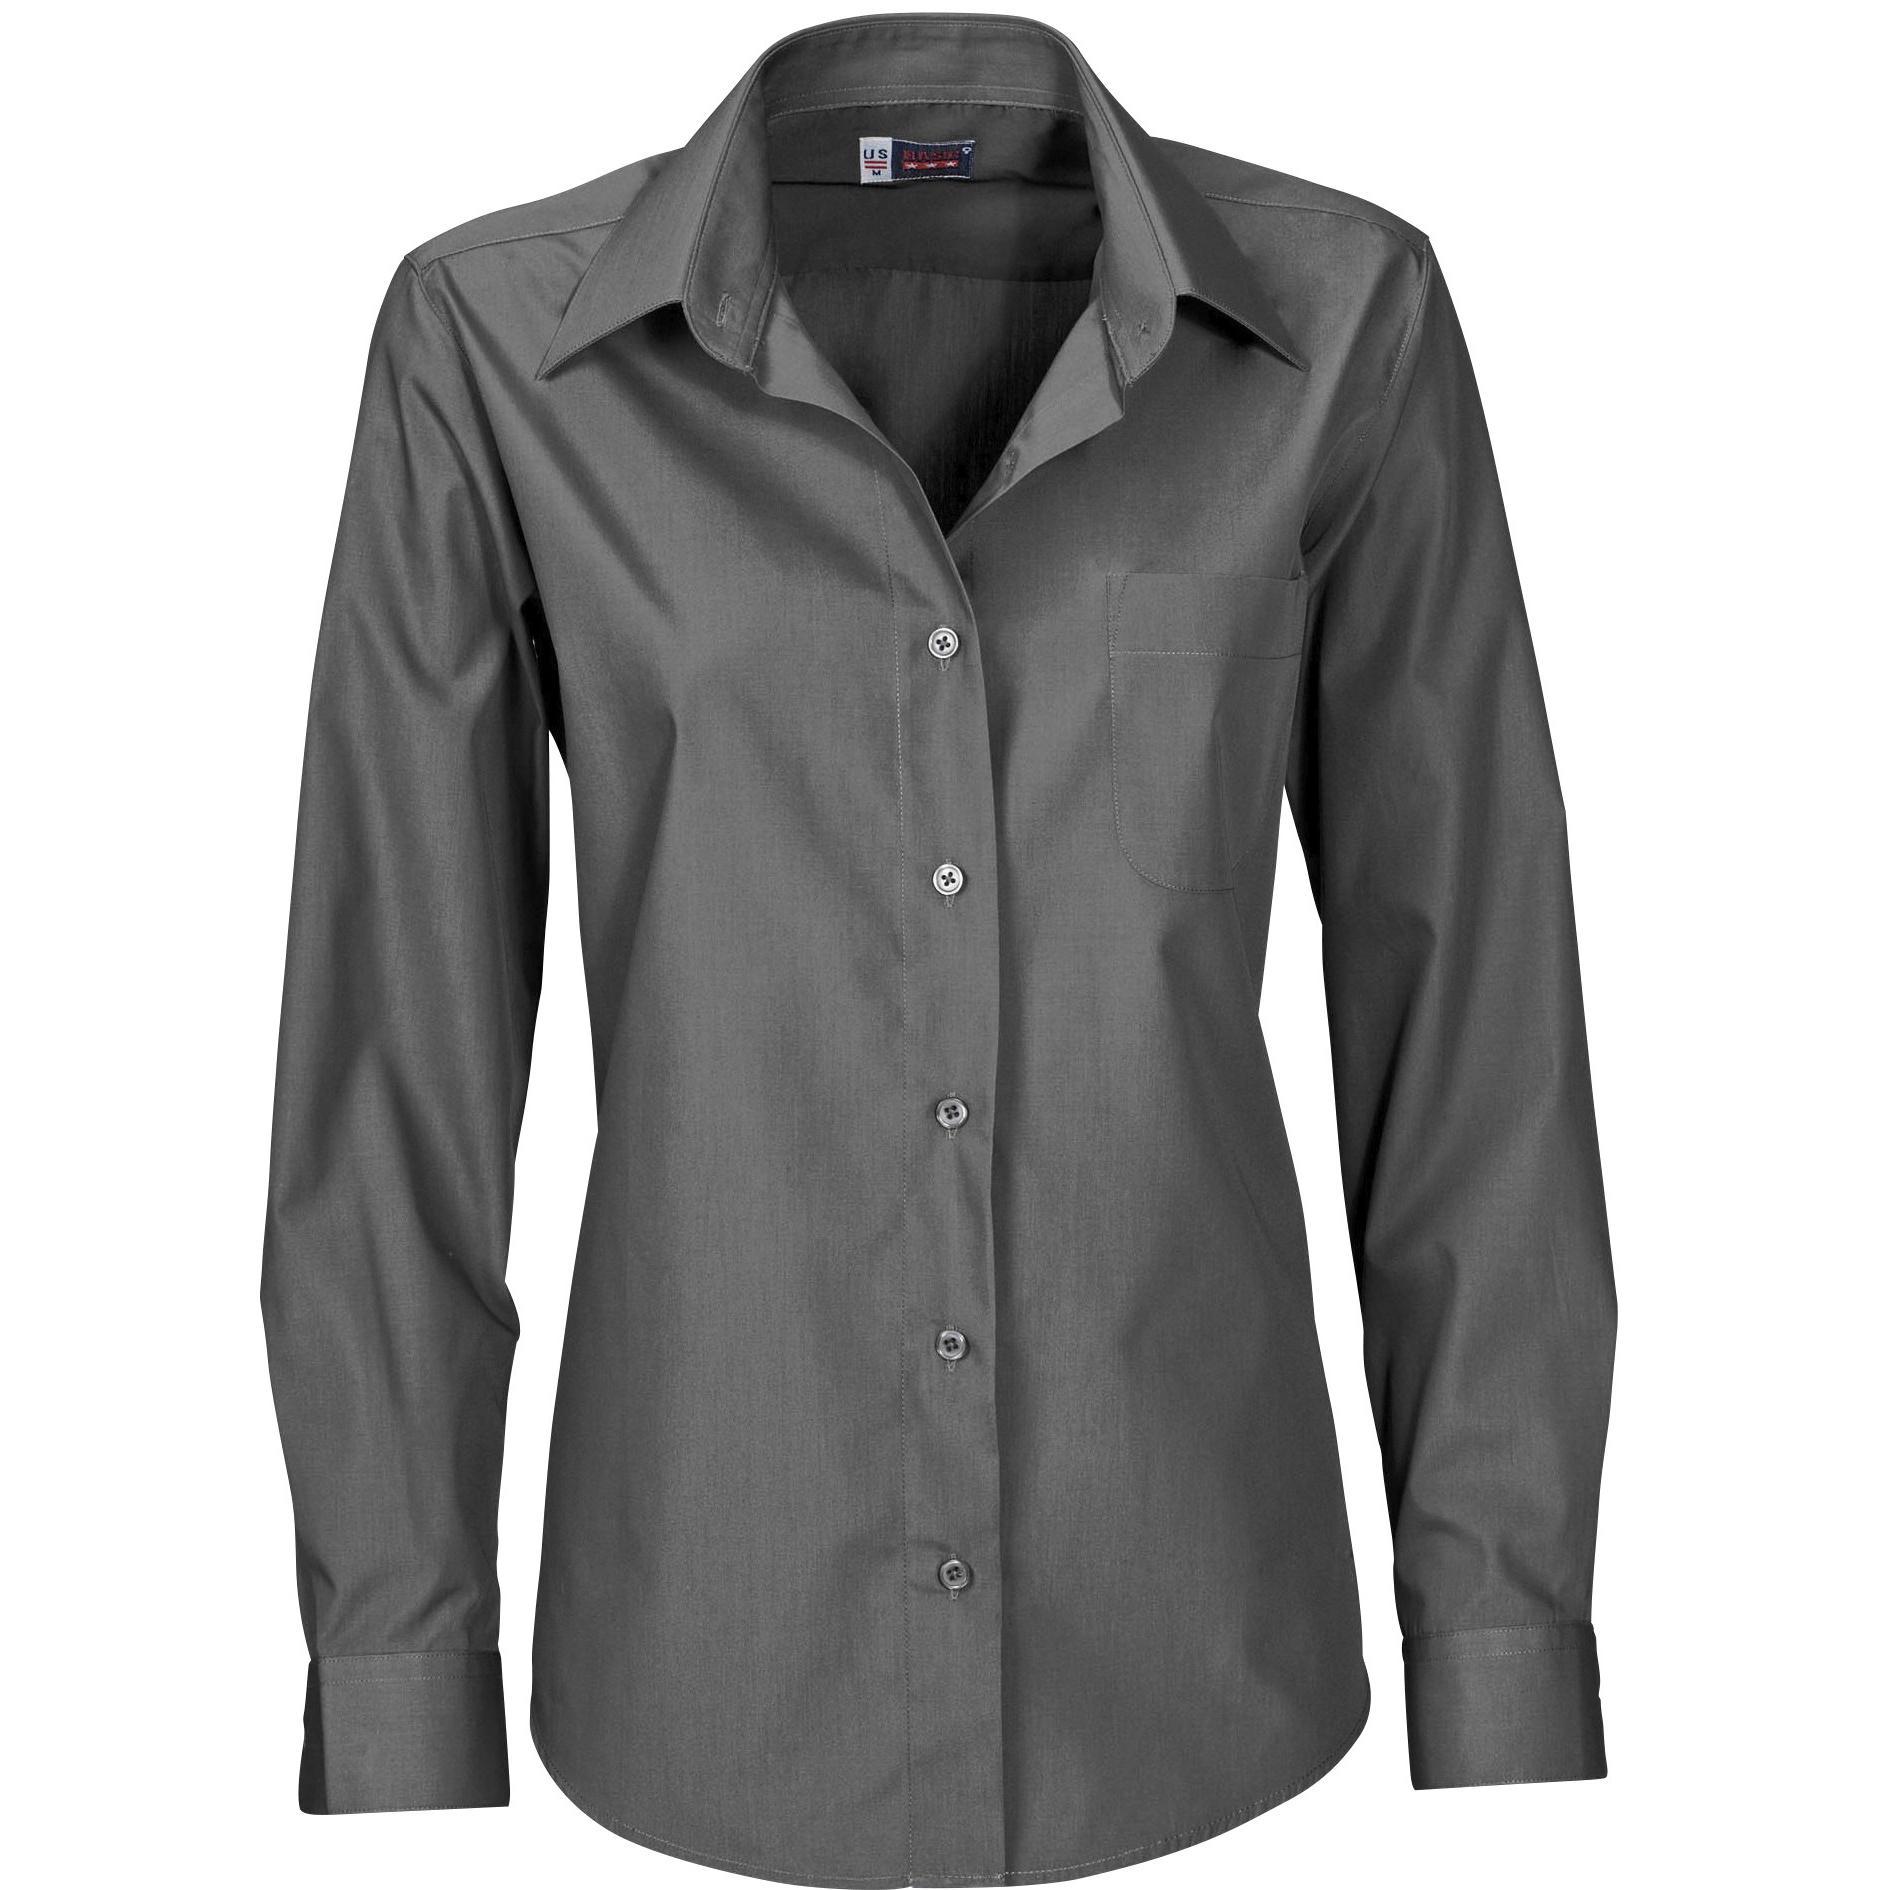 Ladies Long Sleeve Washington Shirt - Grey Only